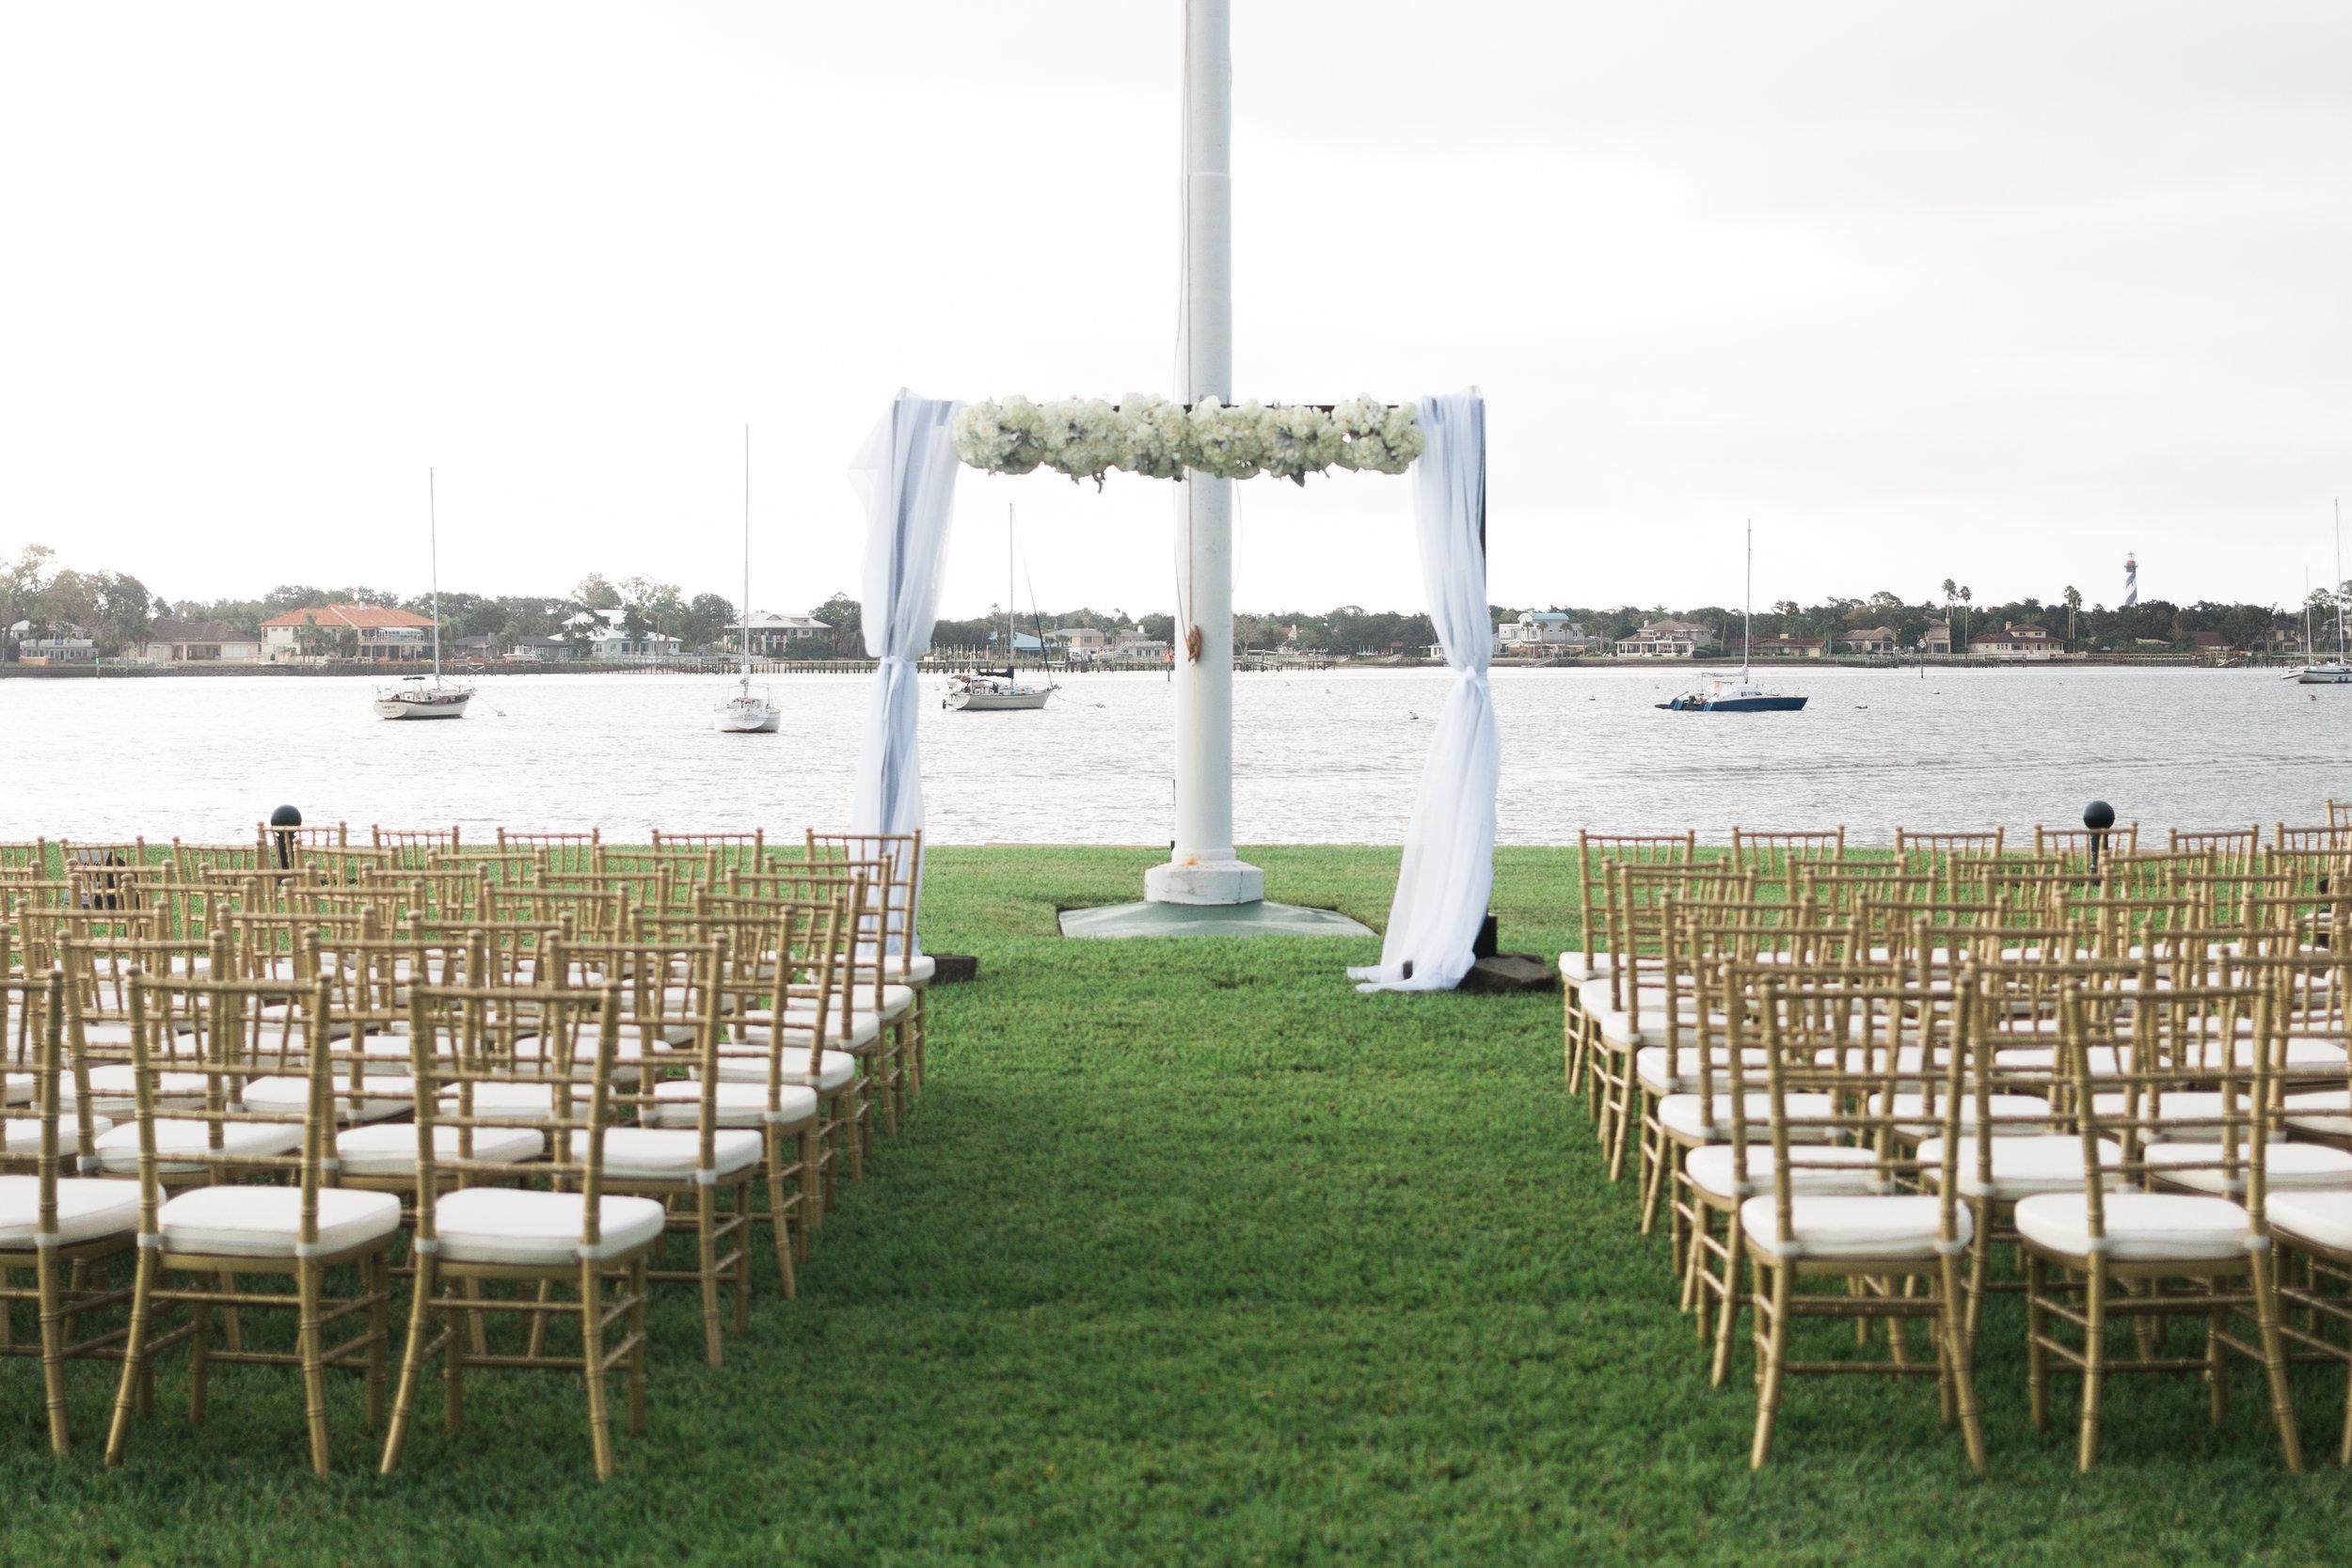 Taylor_TJ_St_Augustine_Treasury_on_the_Plaza_Wedding_Photography__0020_-20.jpg